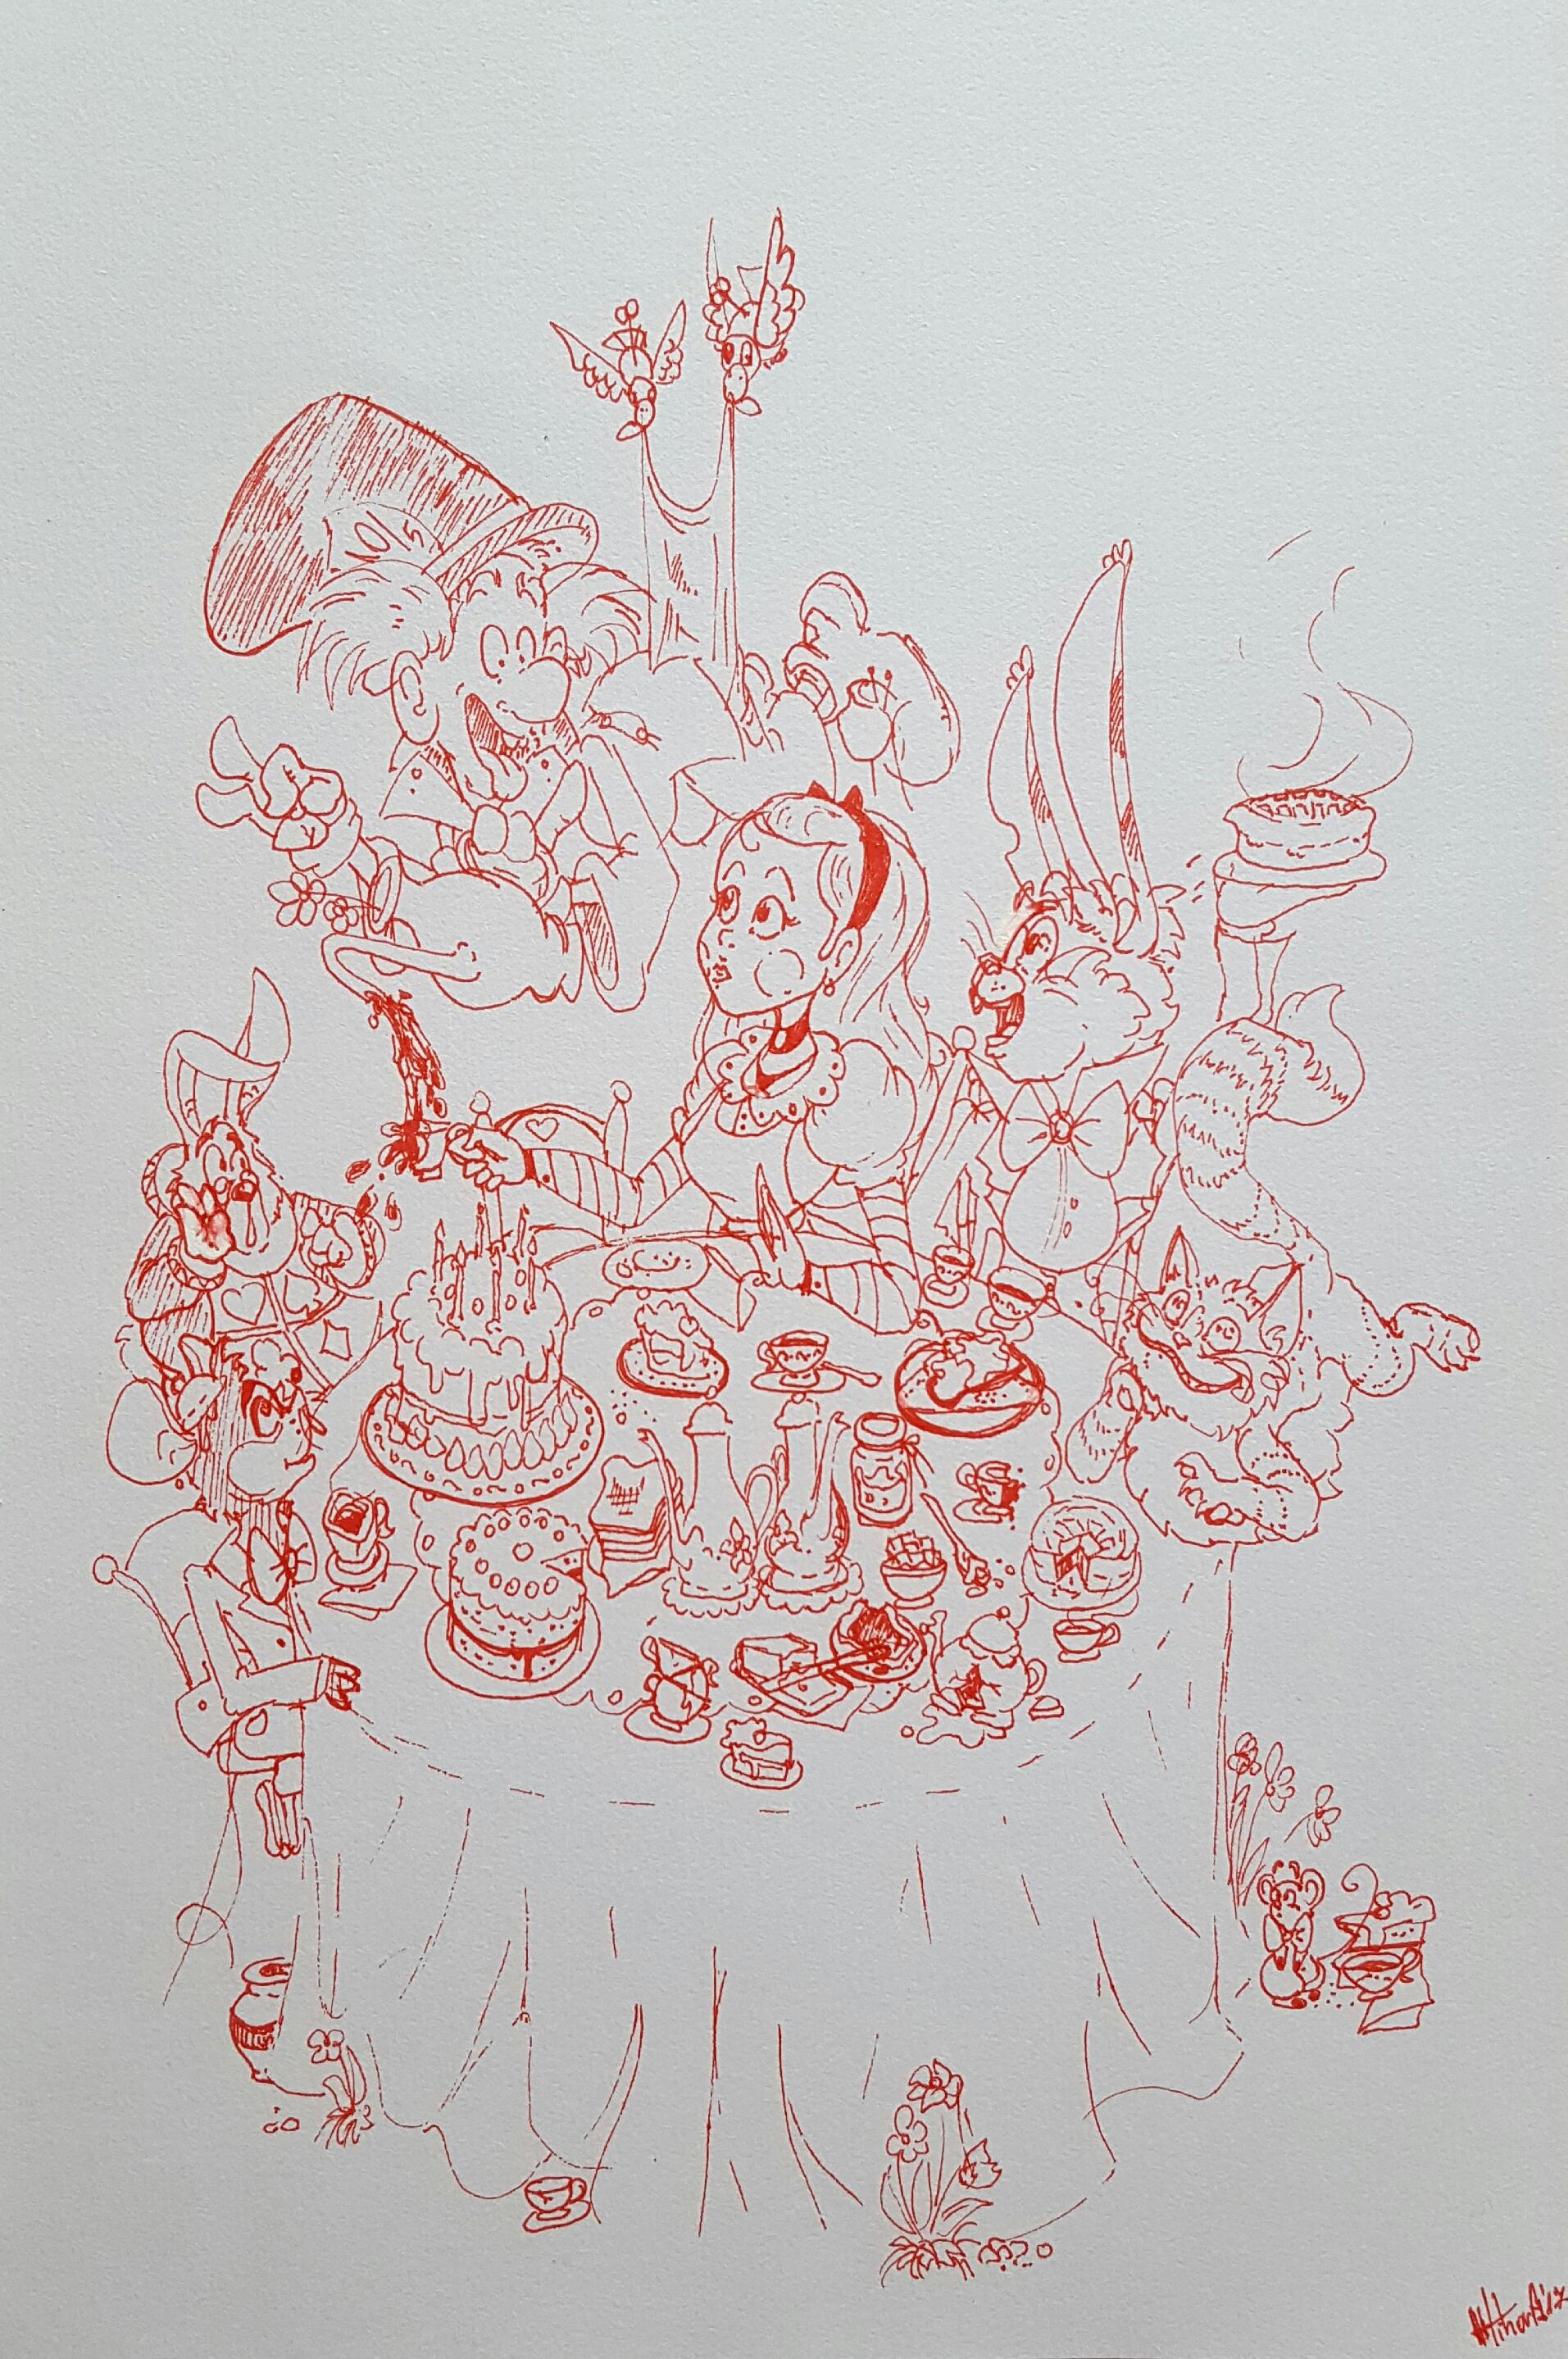 Alice in Wonderland-Mad Hatter's tea party (ink)